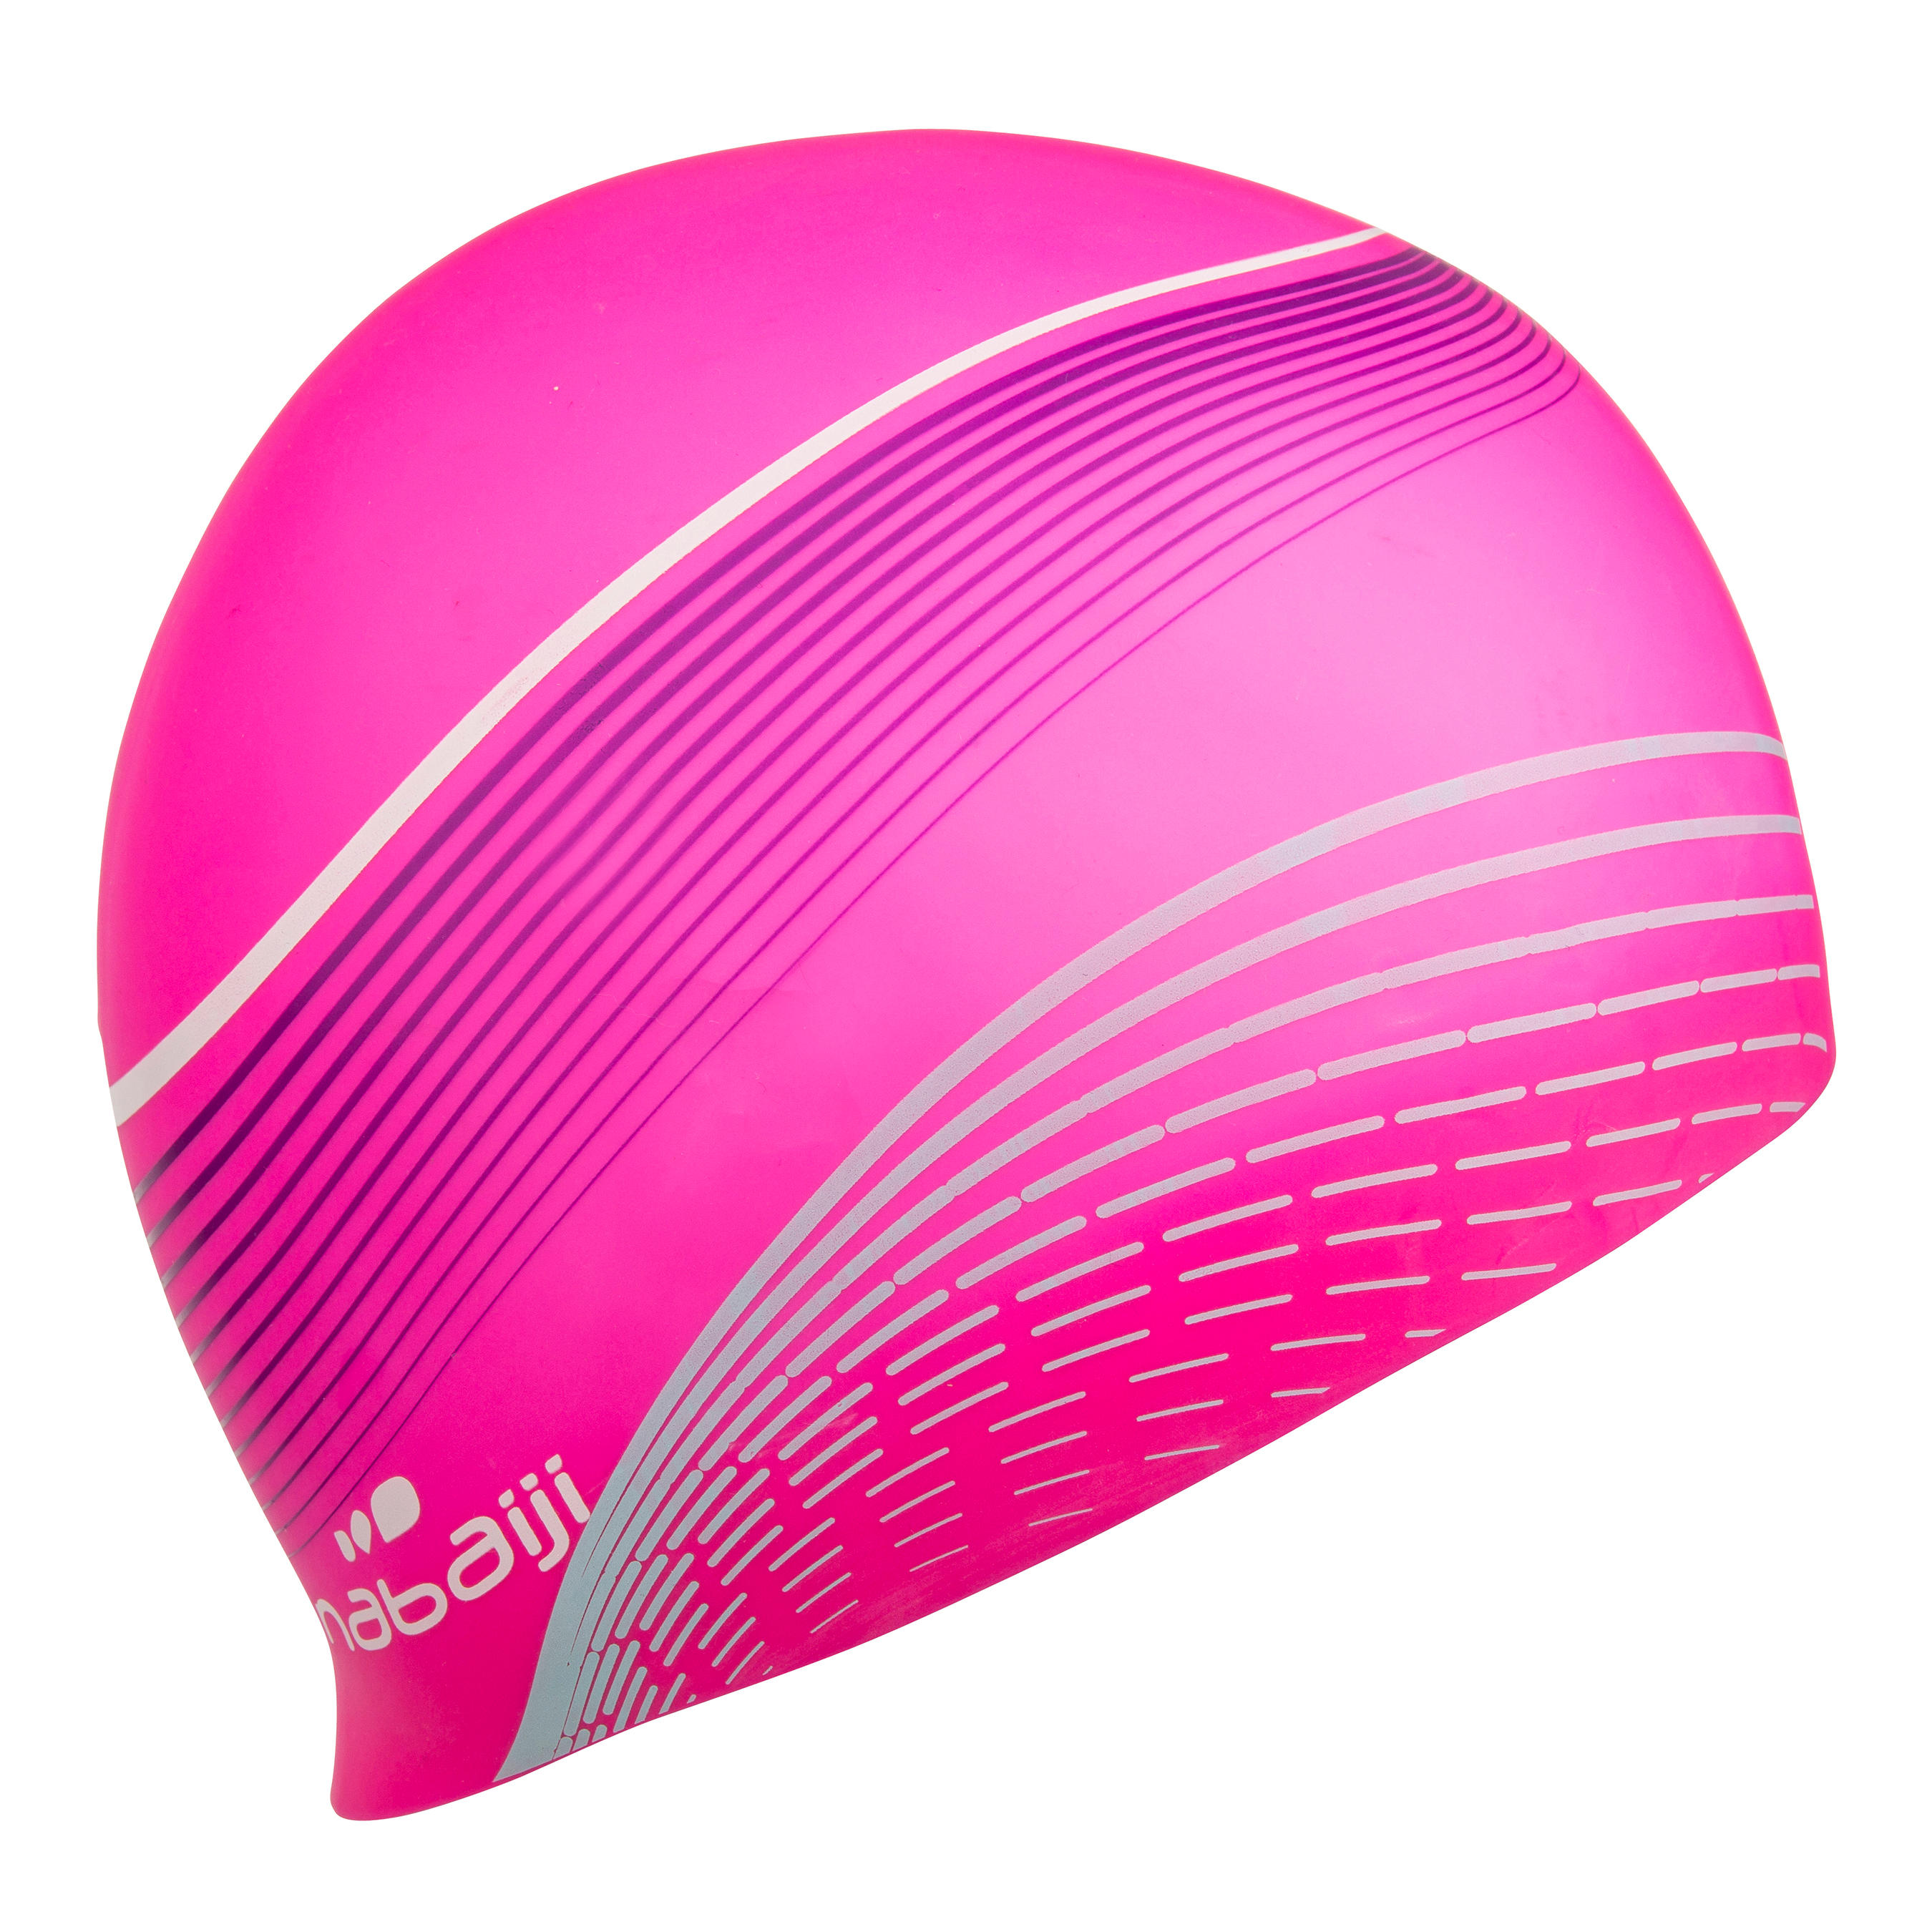 Swim Cap Silicone - Printed Pink